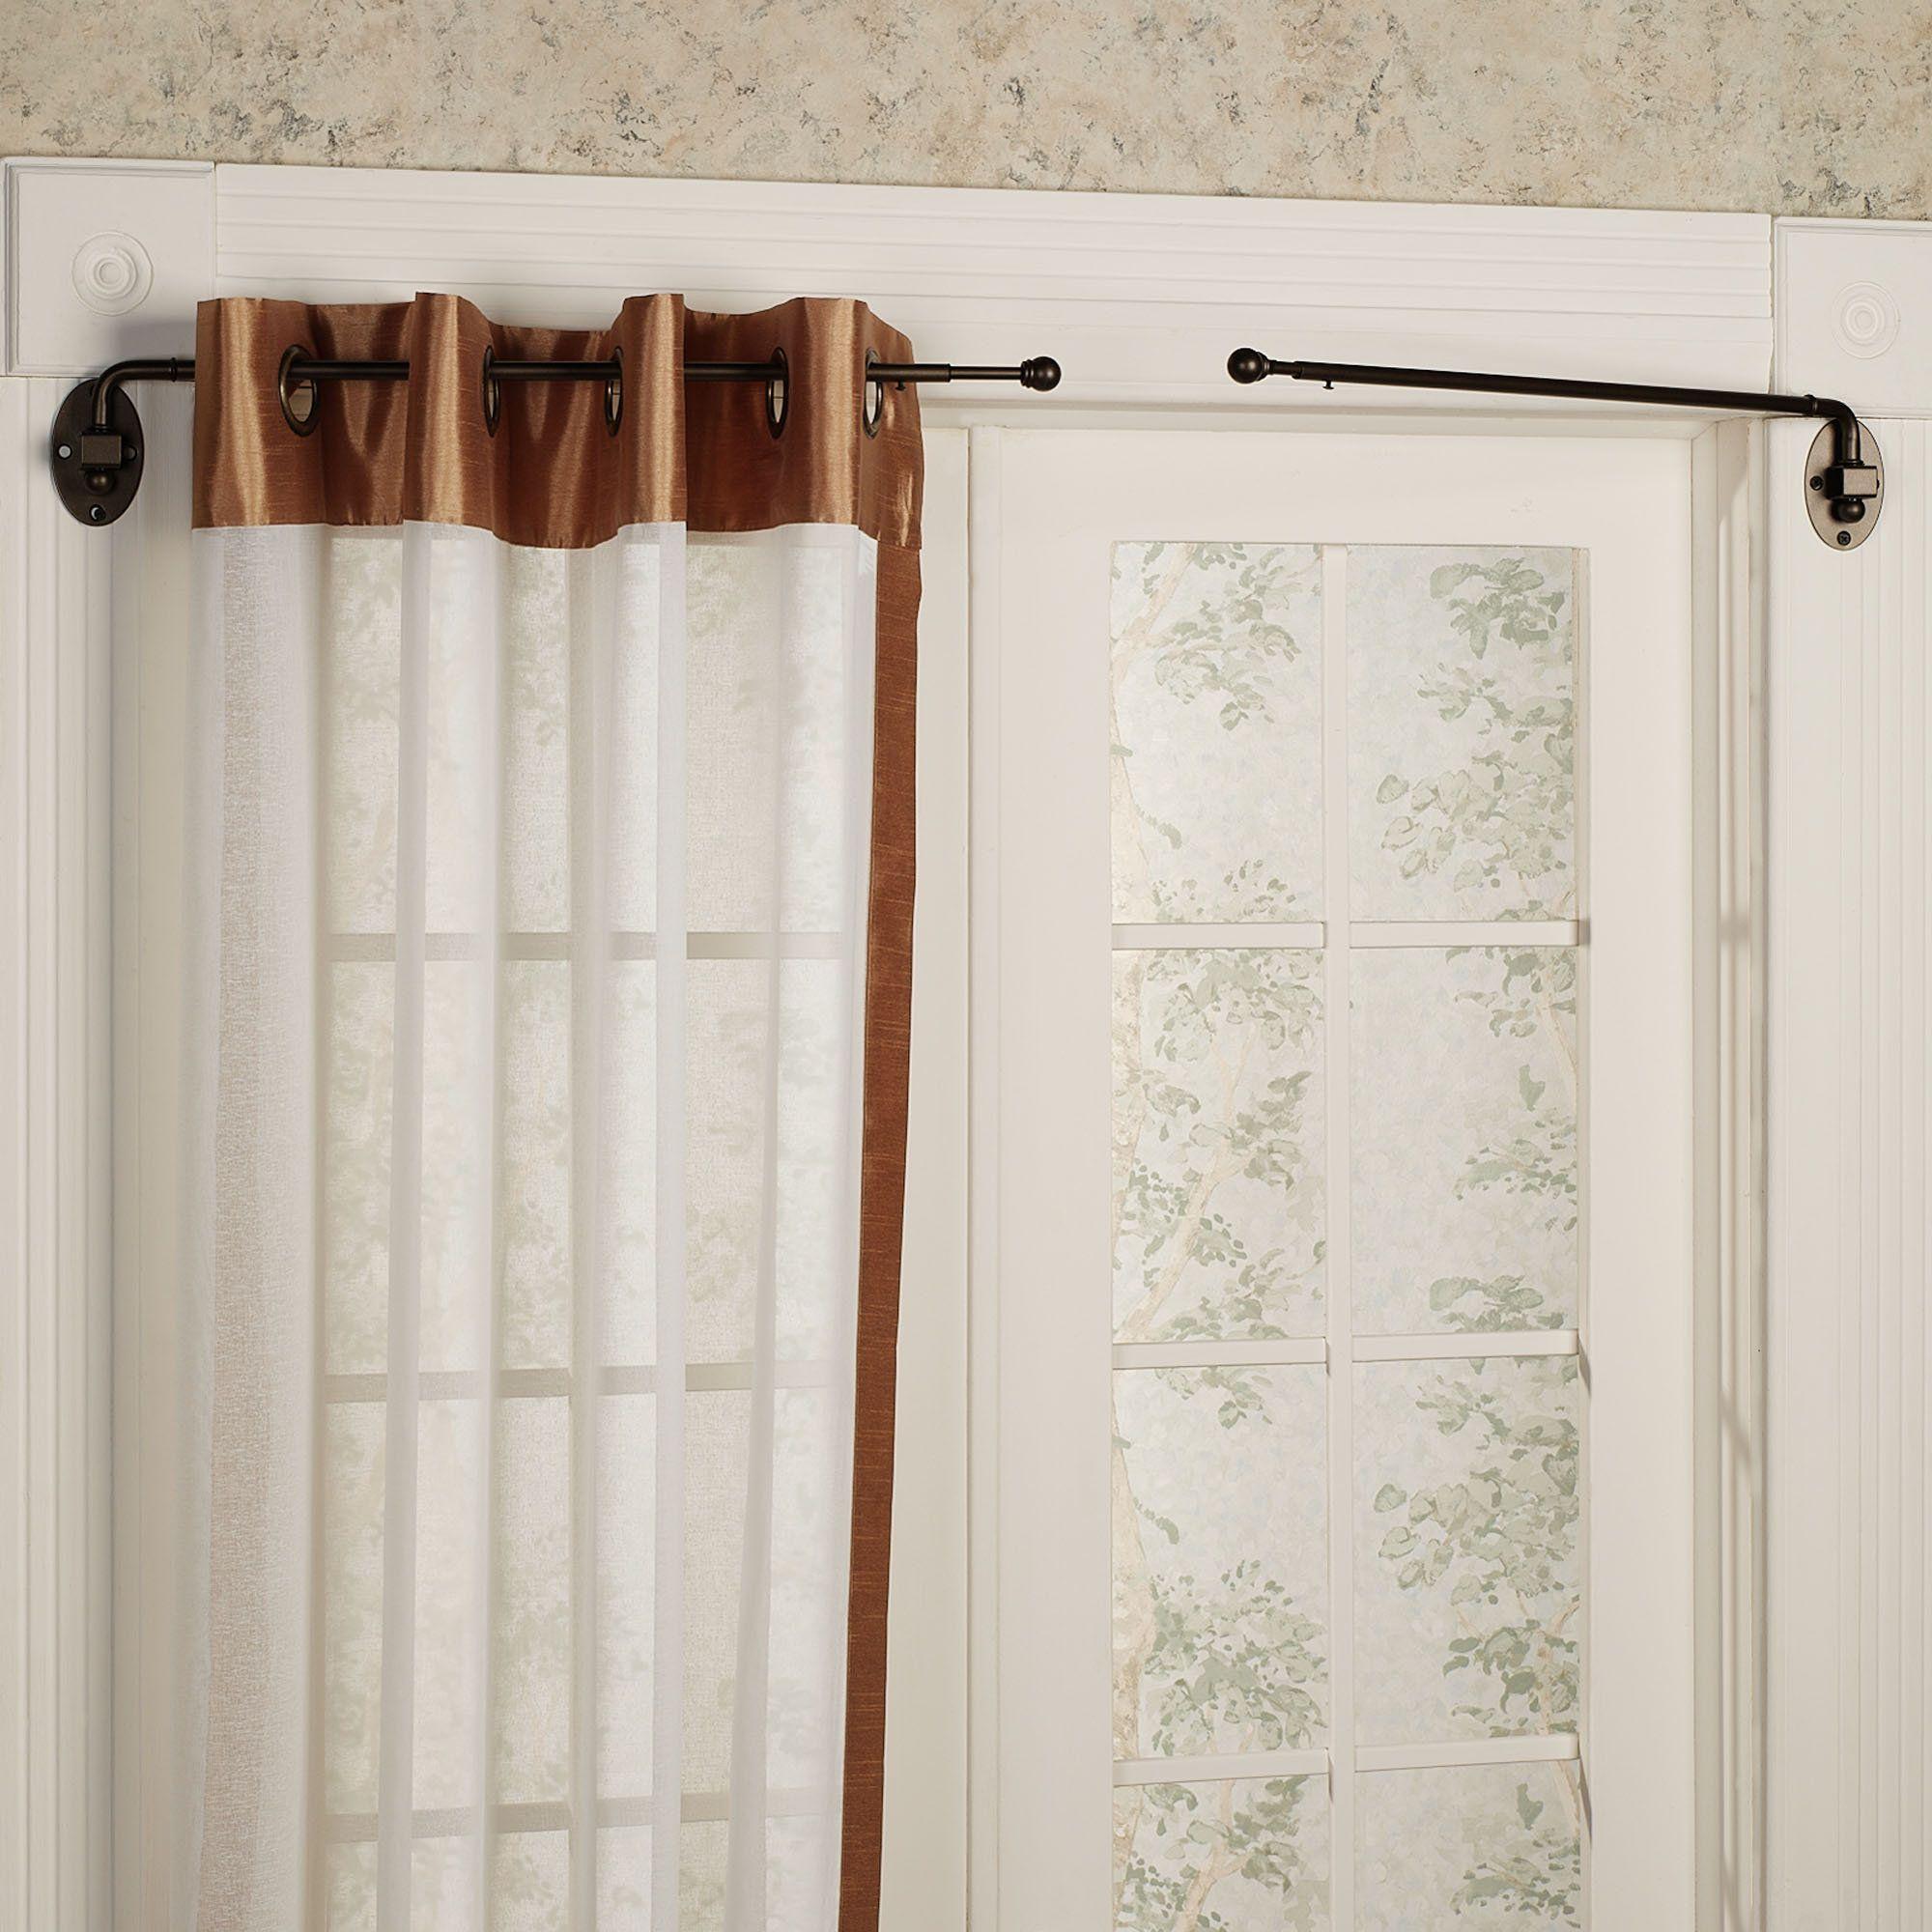 Adjustable Swing Arm Rod Set 20 To 36 Hidup